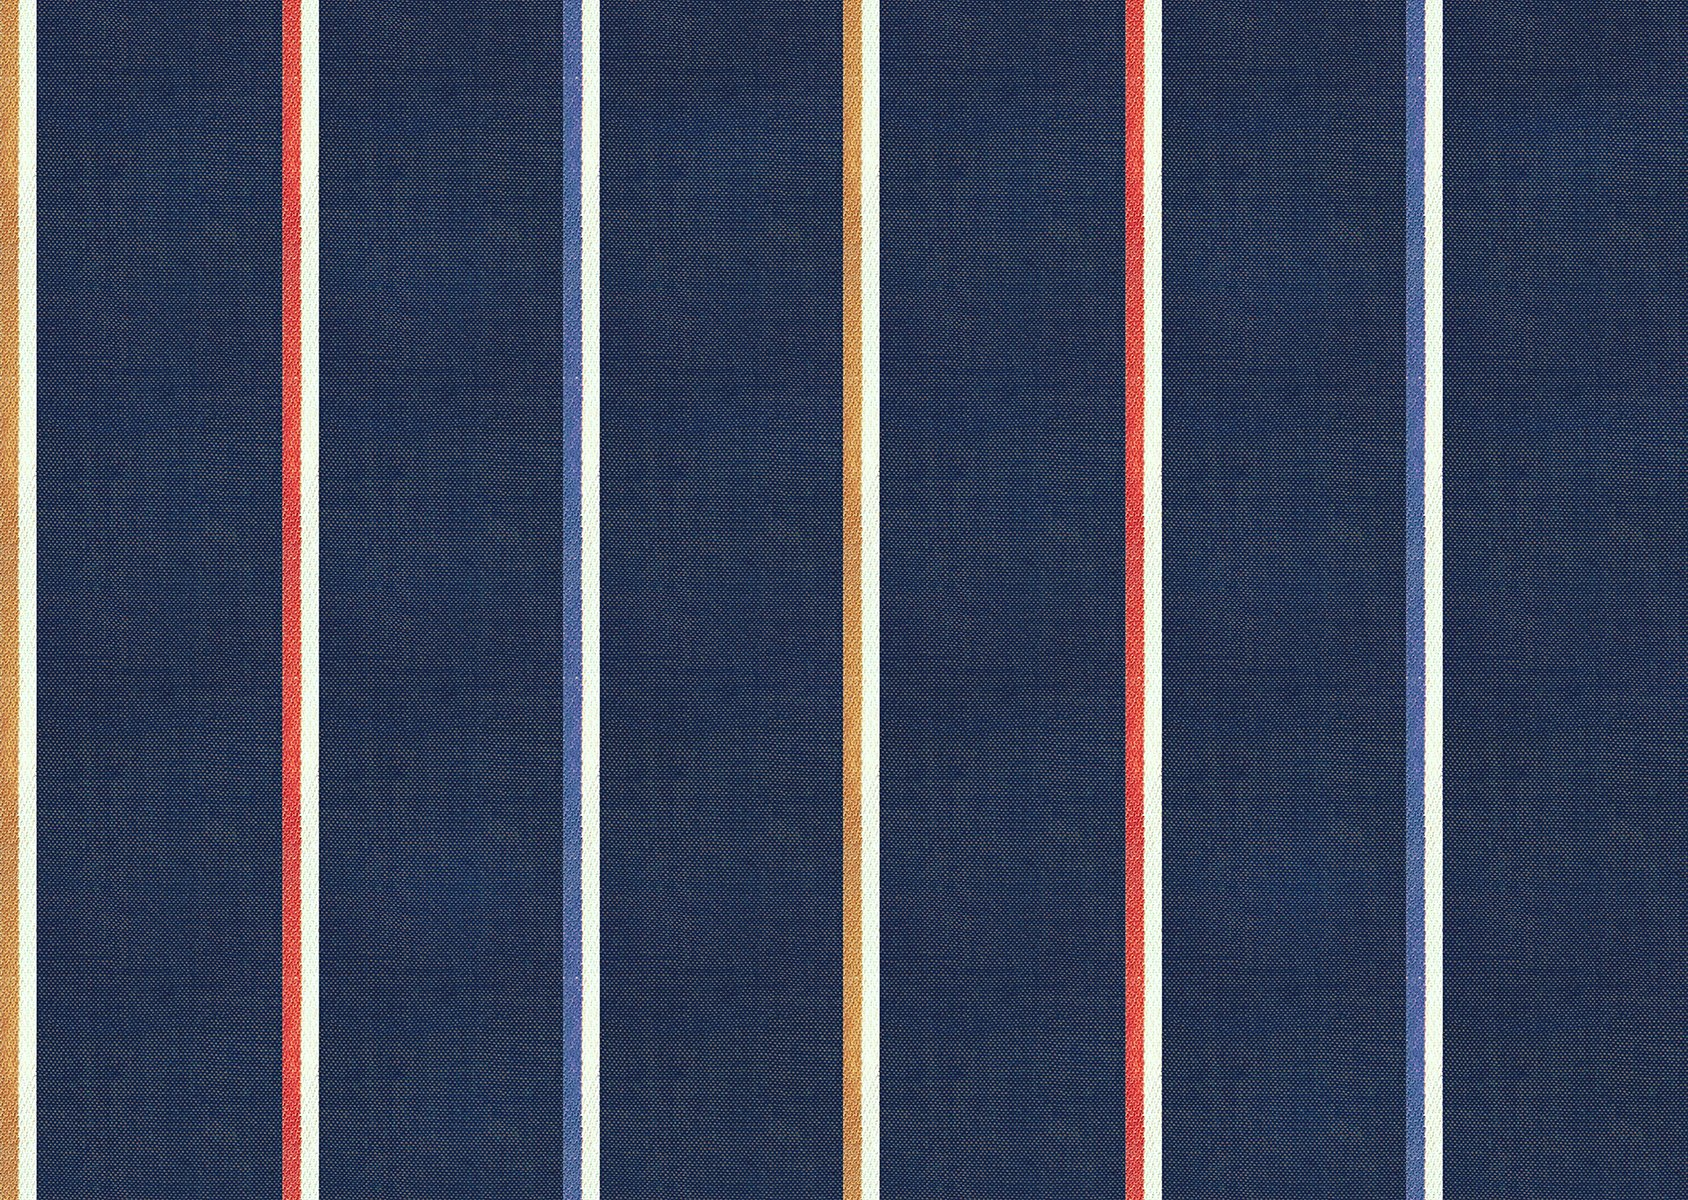 Ruby Star Society Warp & Weft Heirloom Yarn-Dyed Wovens - Linework Lightweight - Navy